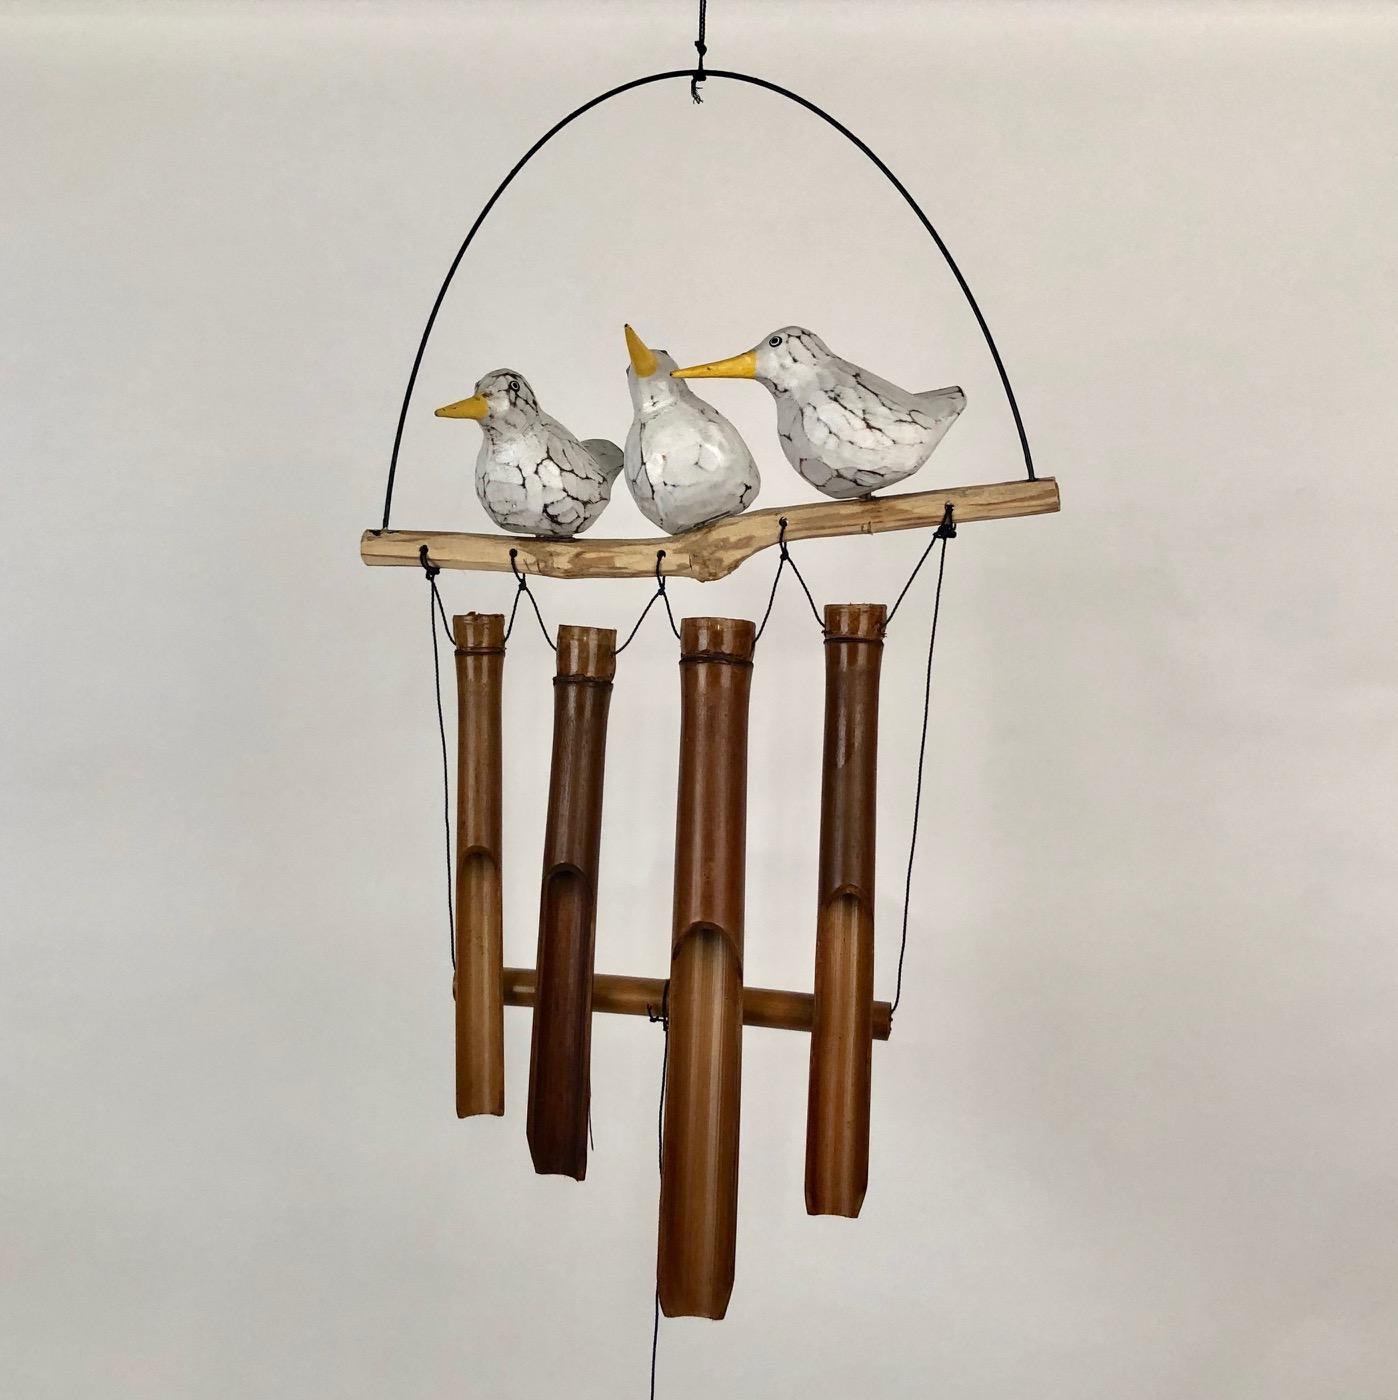 Bamboe windgong 3 vogels op stok 52411